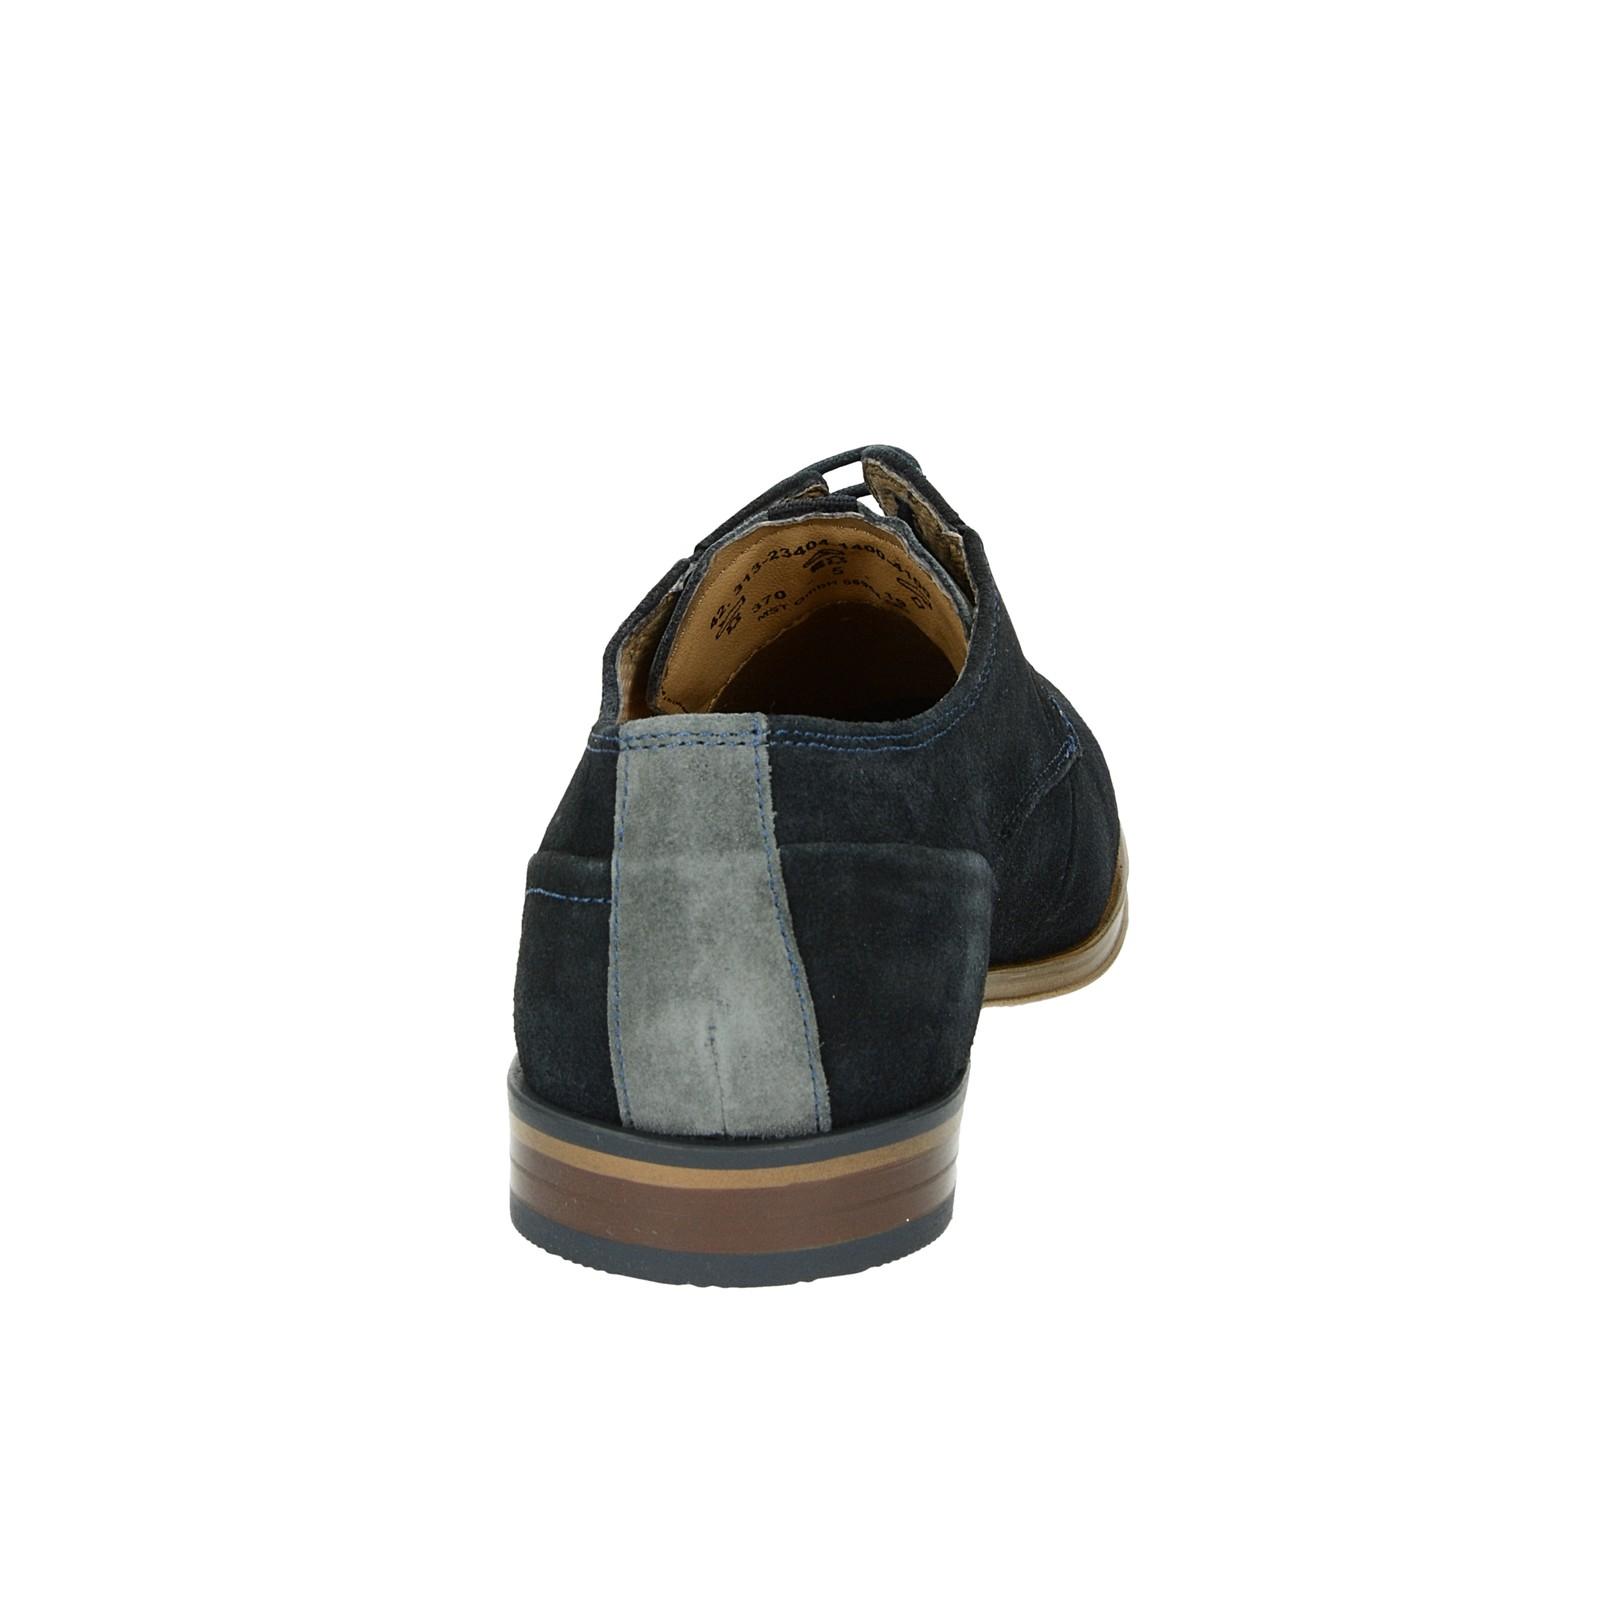 b62bea490 Bugatti pánske semišové spoločenské topánky - tmavomodré   313-23404 ...